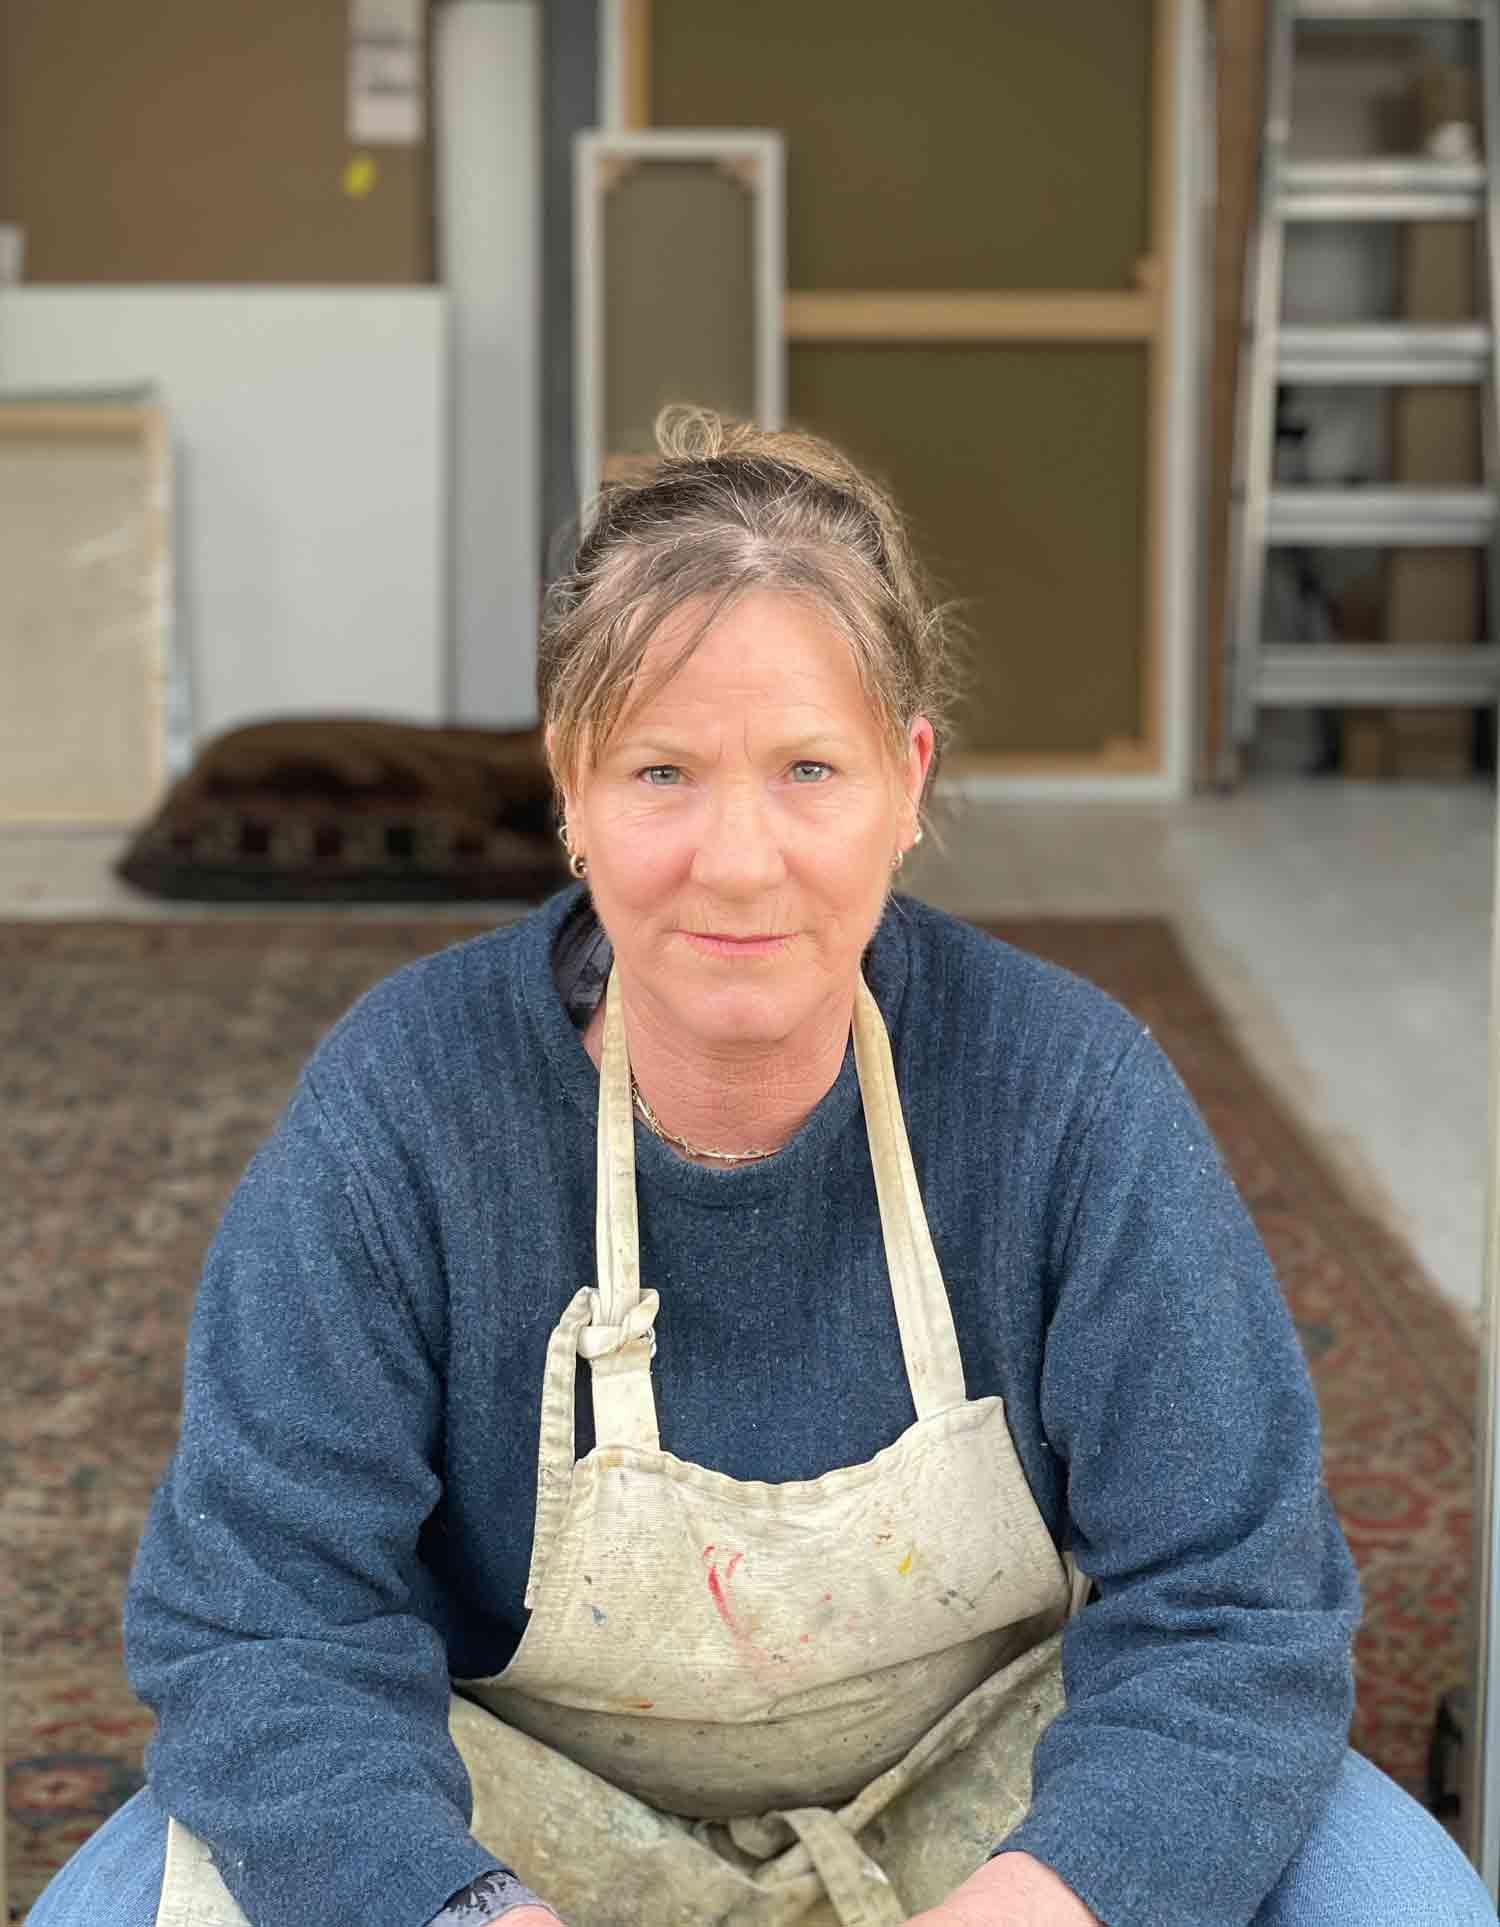 Victoria Orr Ewing - Contemporary British Landscape Painter